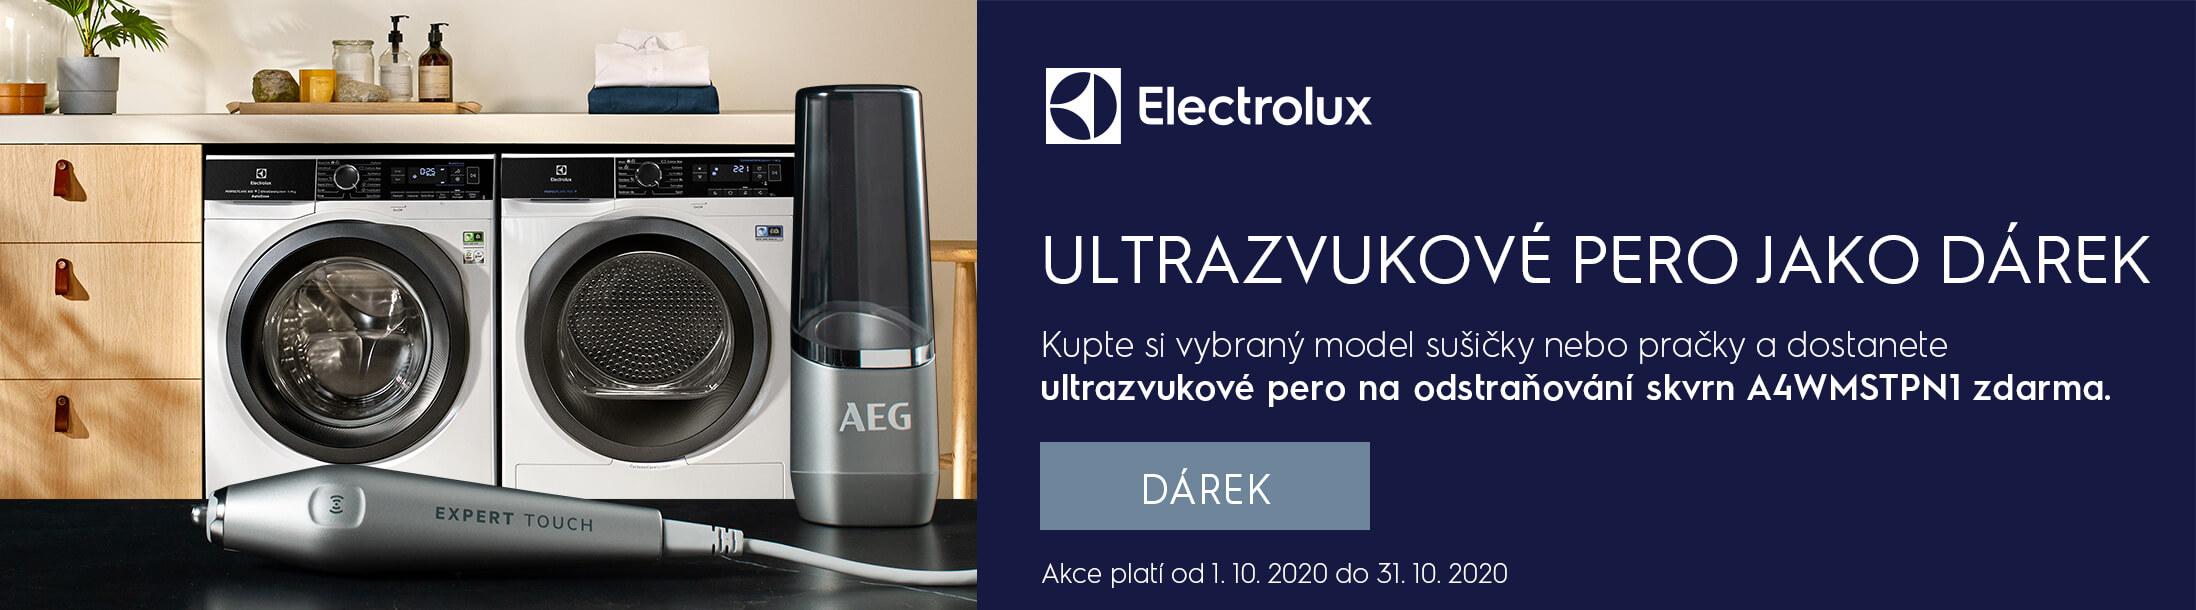 Electrolux - Ultrazvukové pero jako dárek